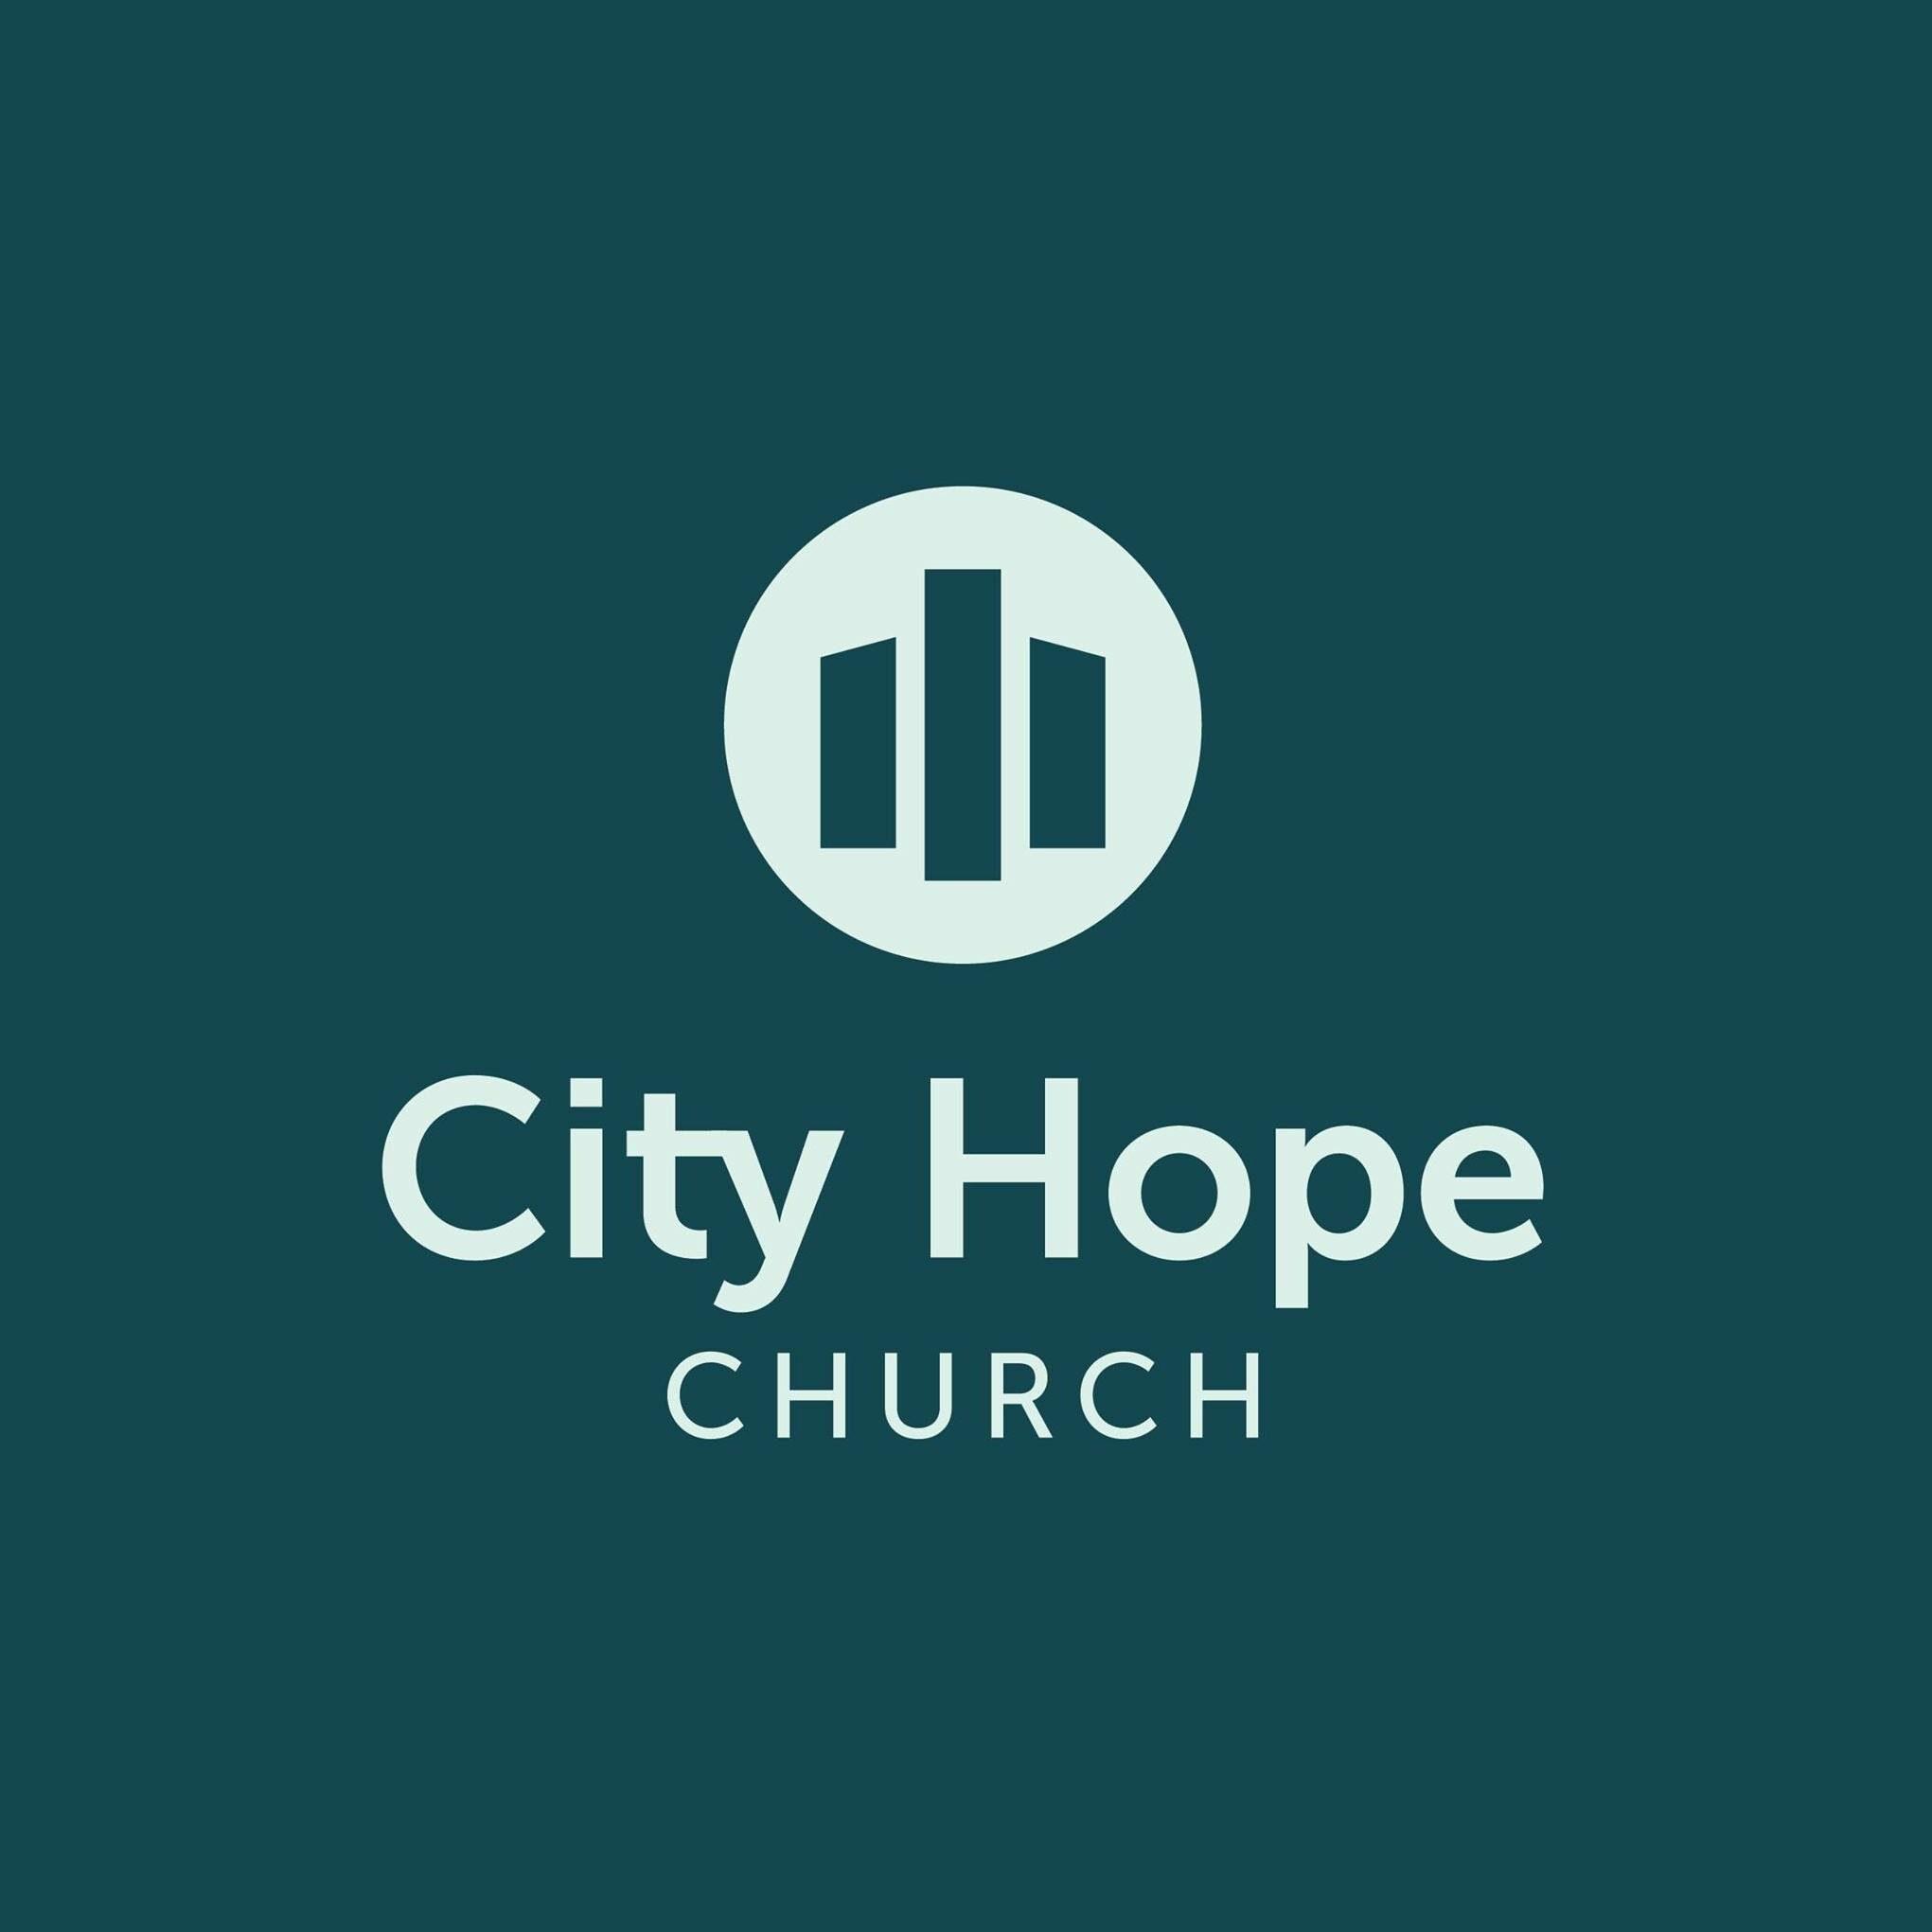 CityHopeChurch